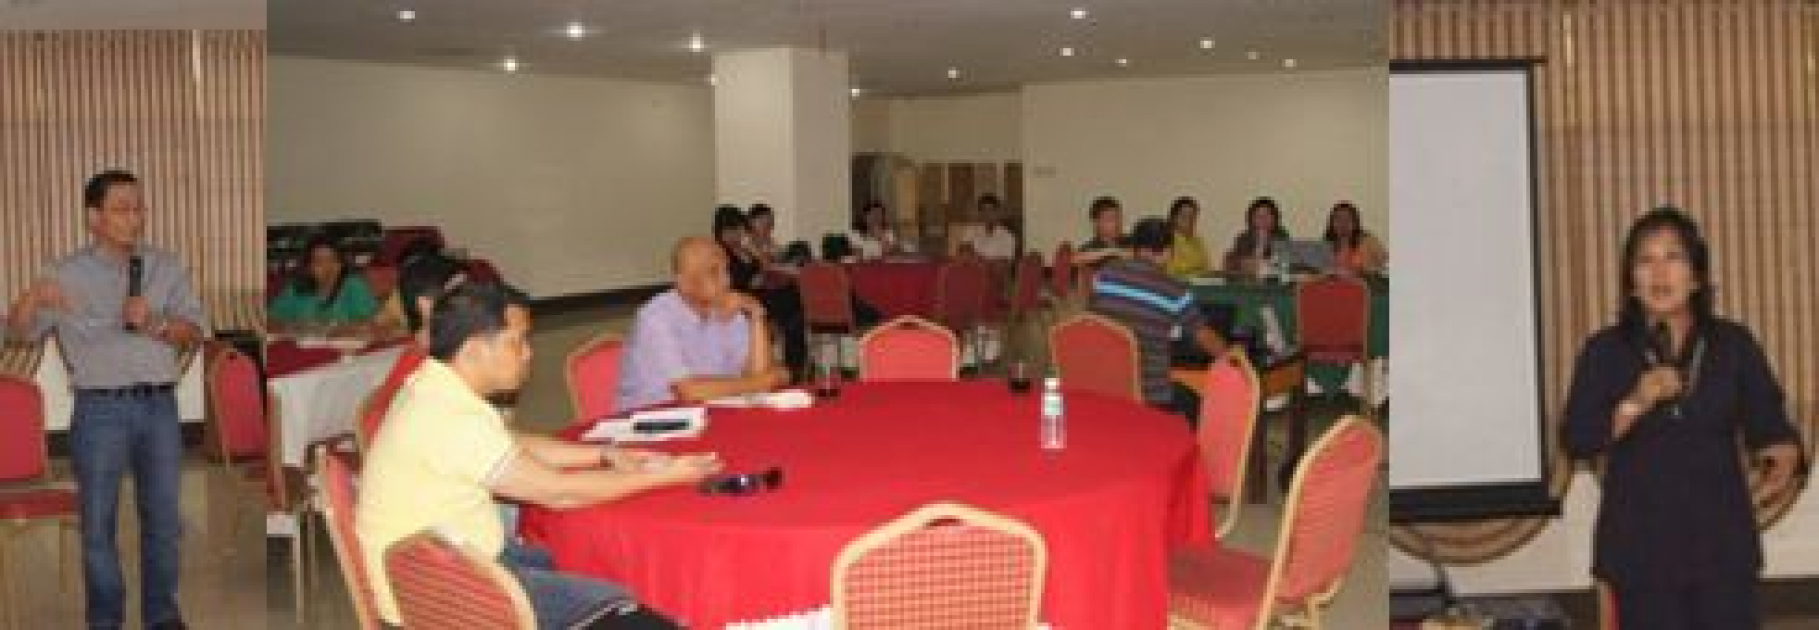 RD3 Dijan, ADBLGD Villasenor conduct exit conference on CBDRM